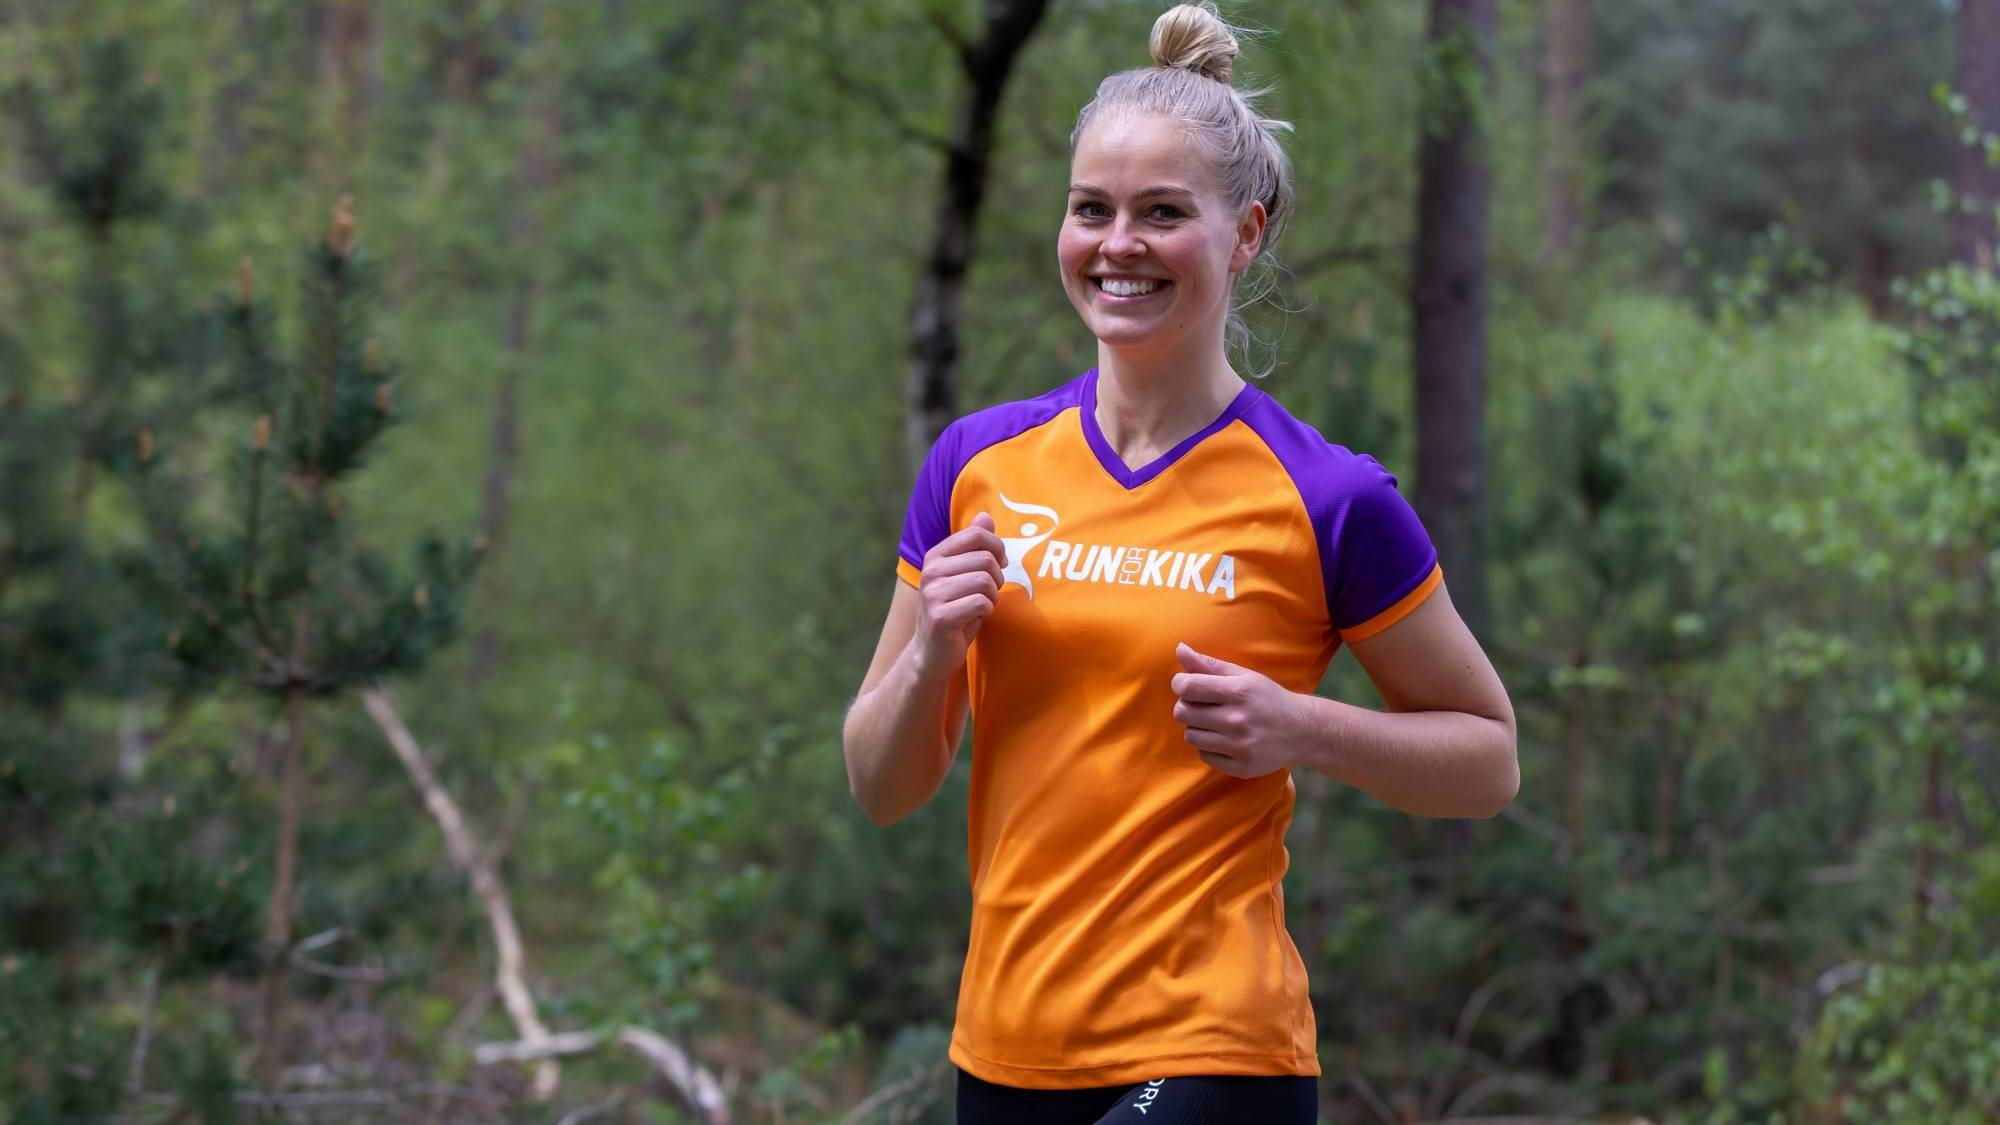 Hardloper Run for KiKa Marathon Veluwe